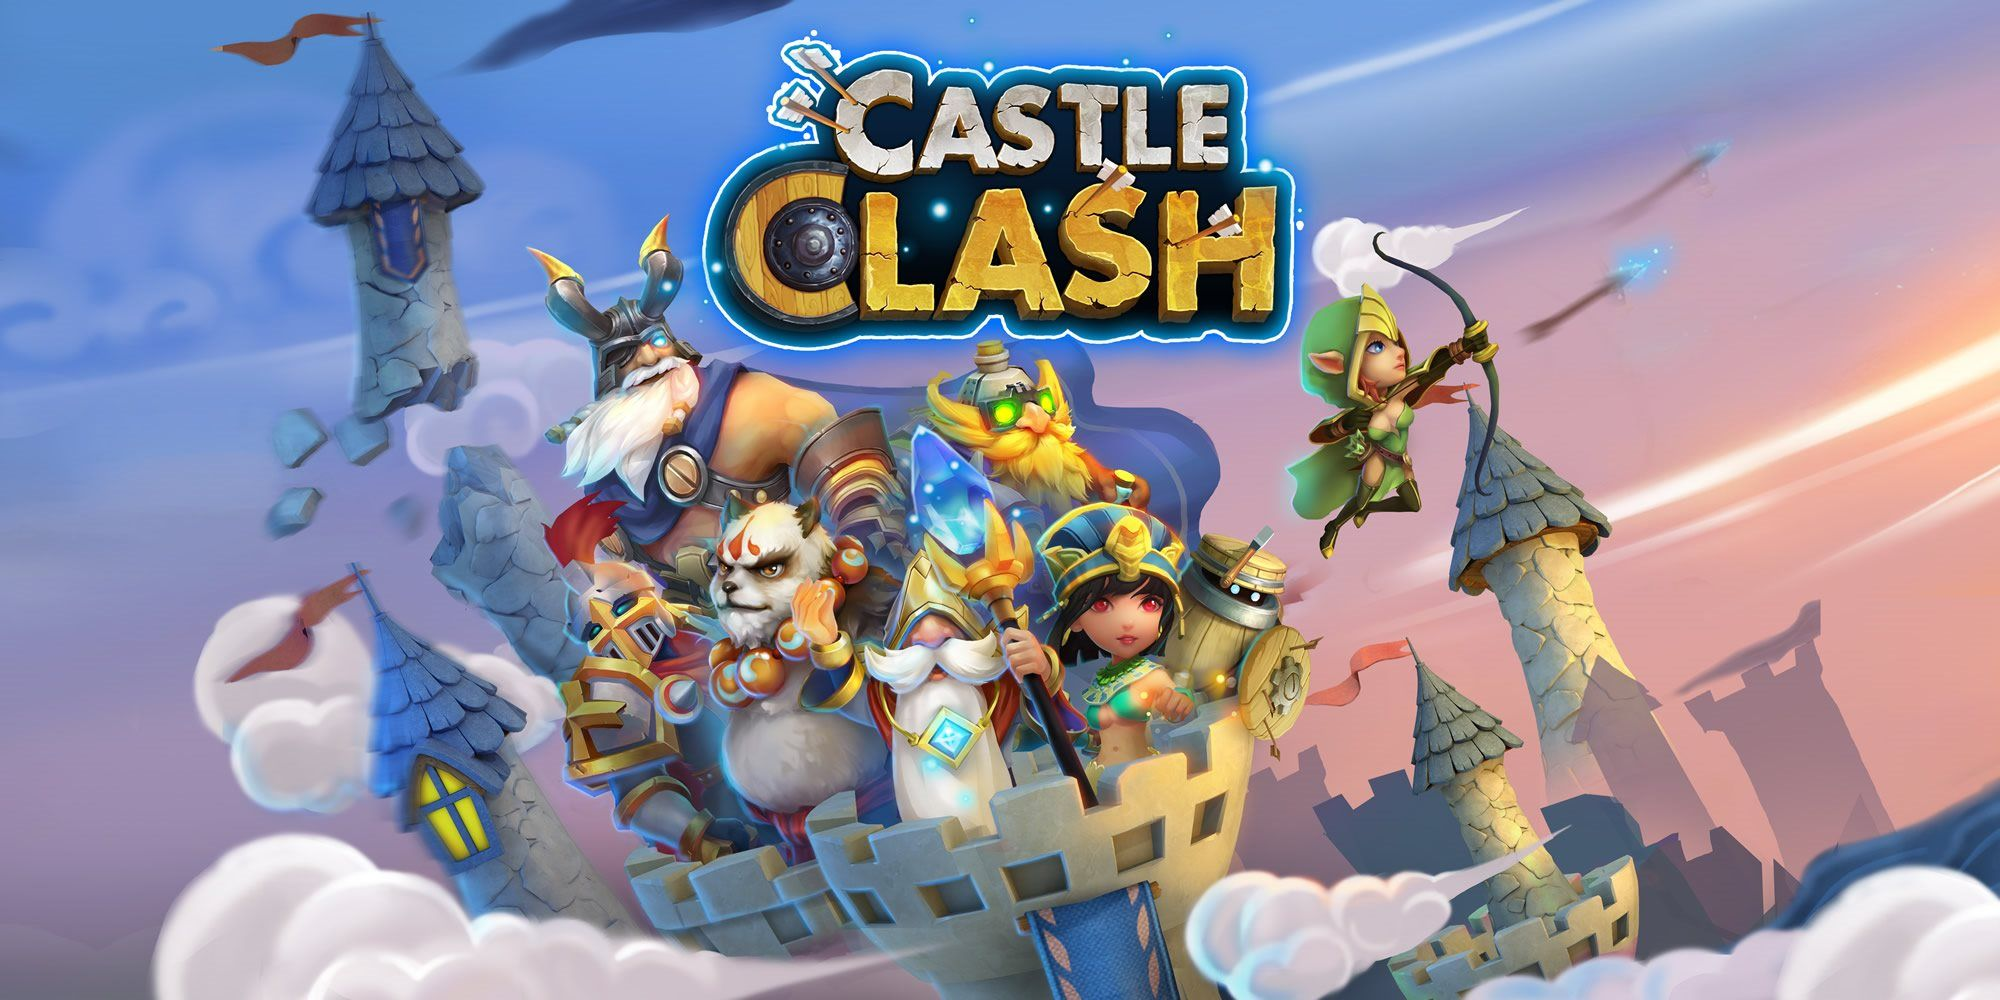 cara hack game castle clash apk